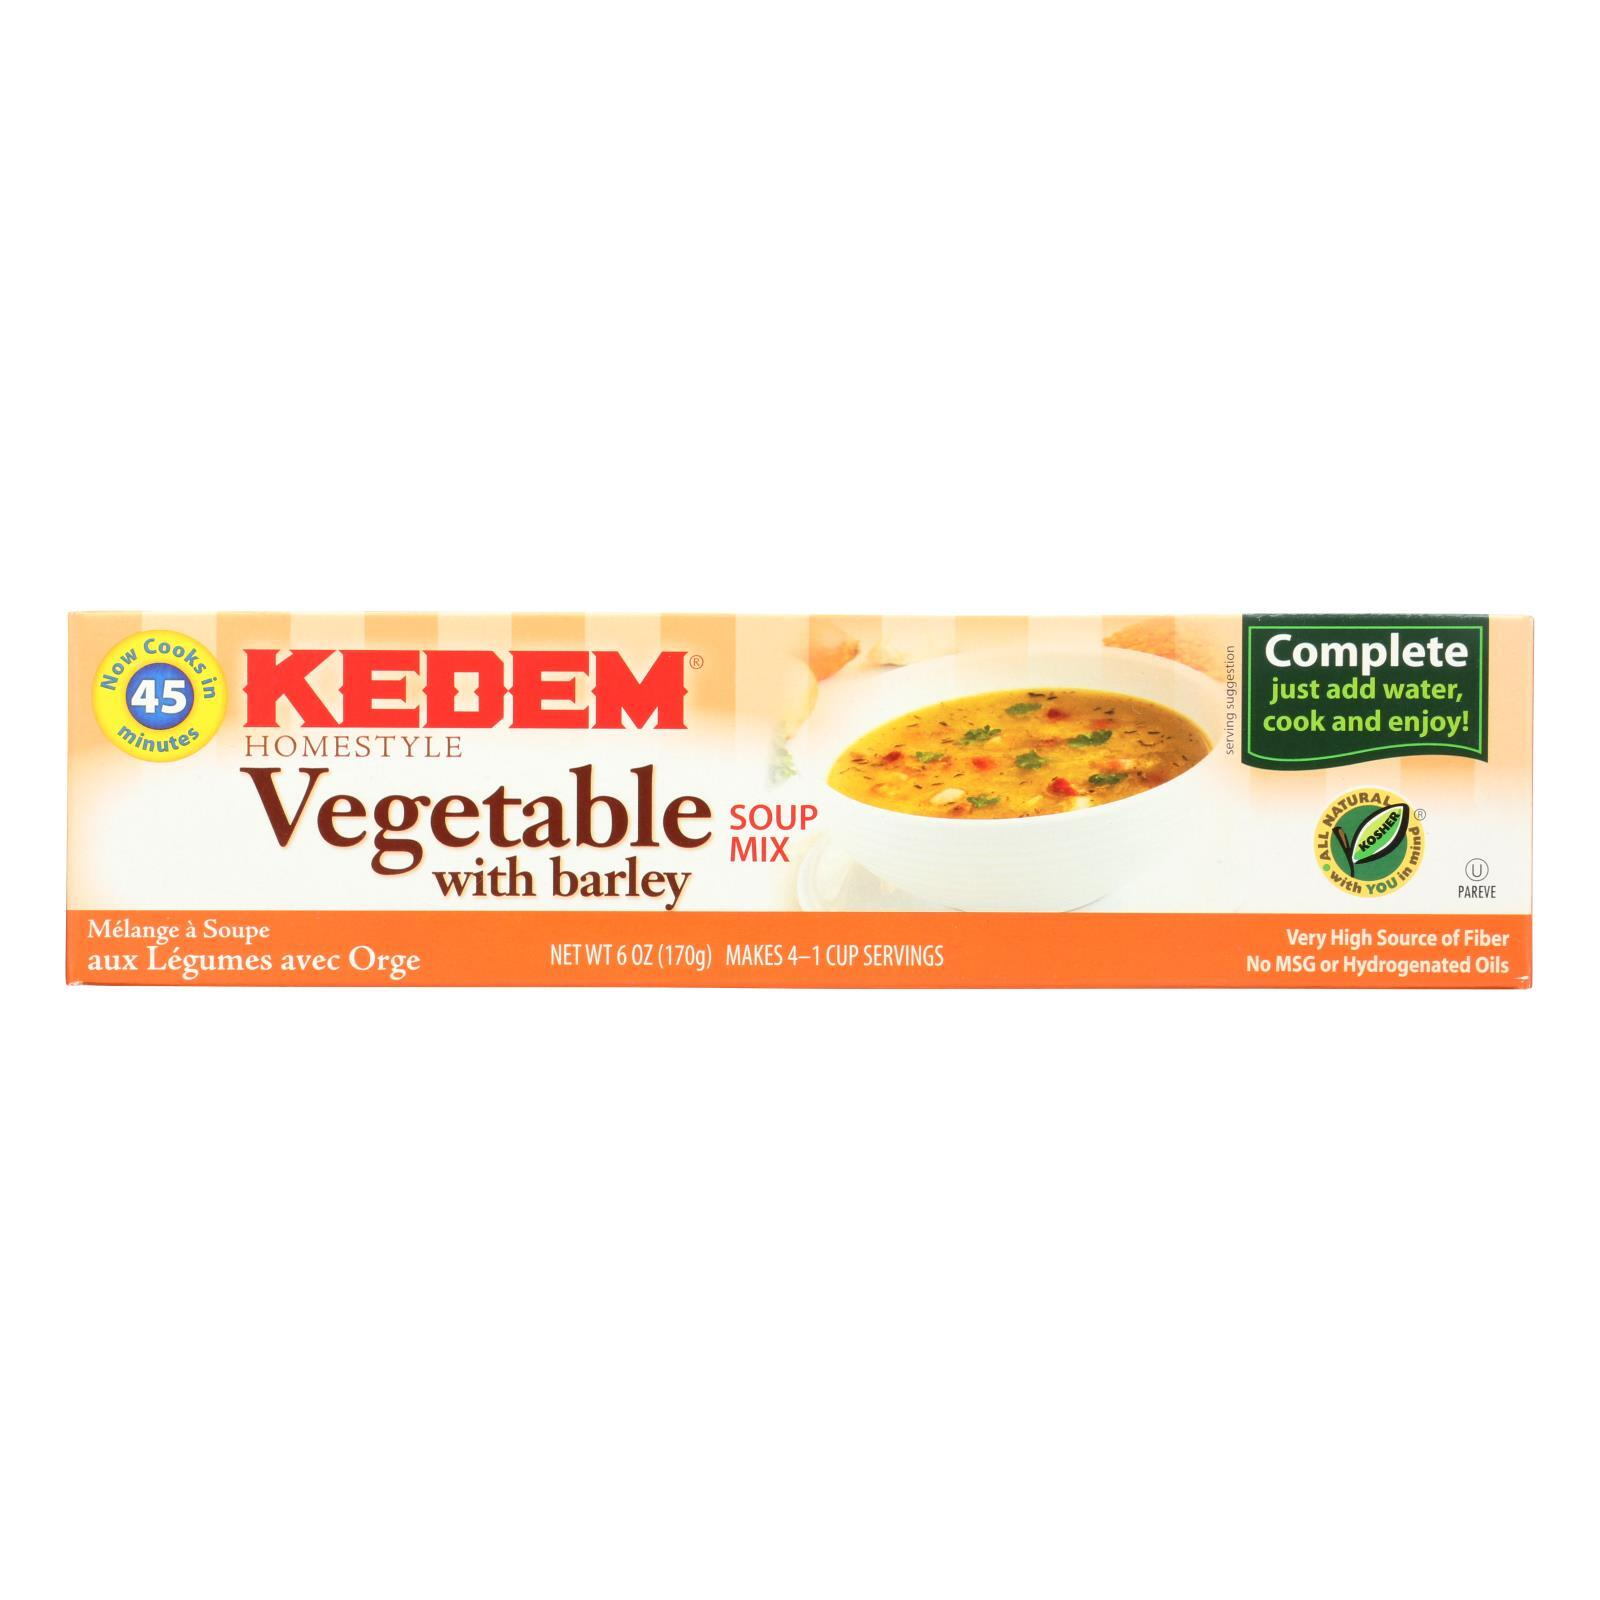 Kedem Vegetable Soup Mix - Case of 24 - 6 oz.